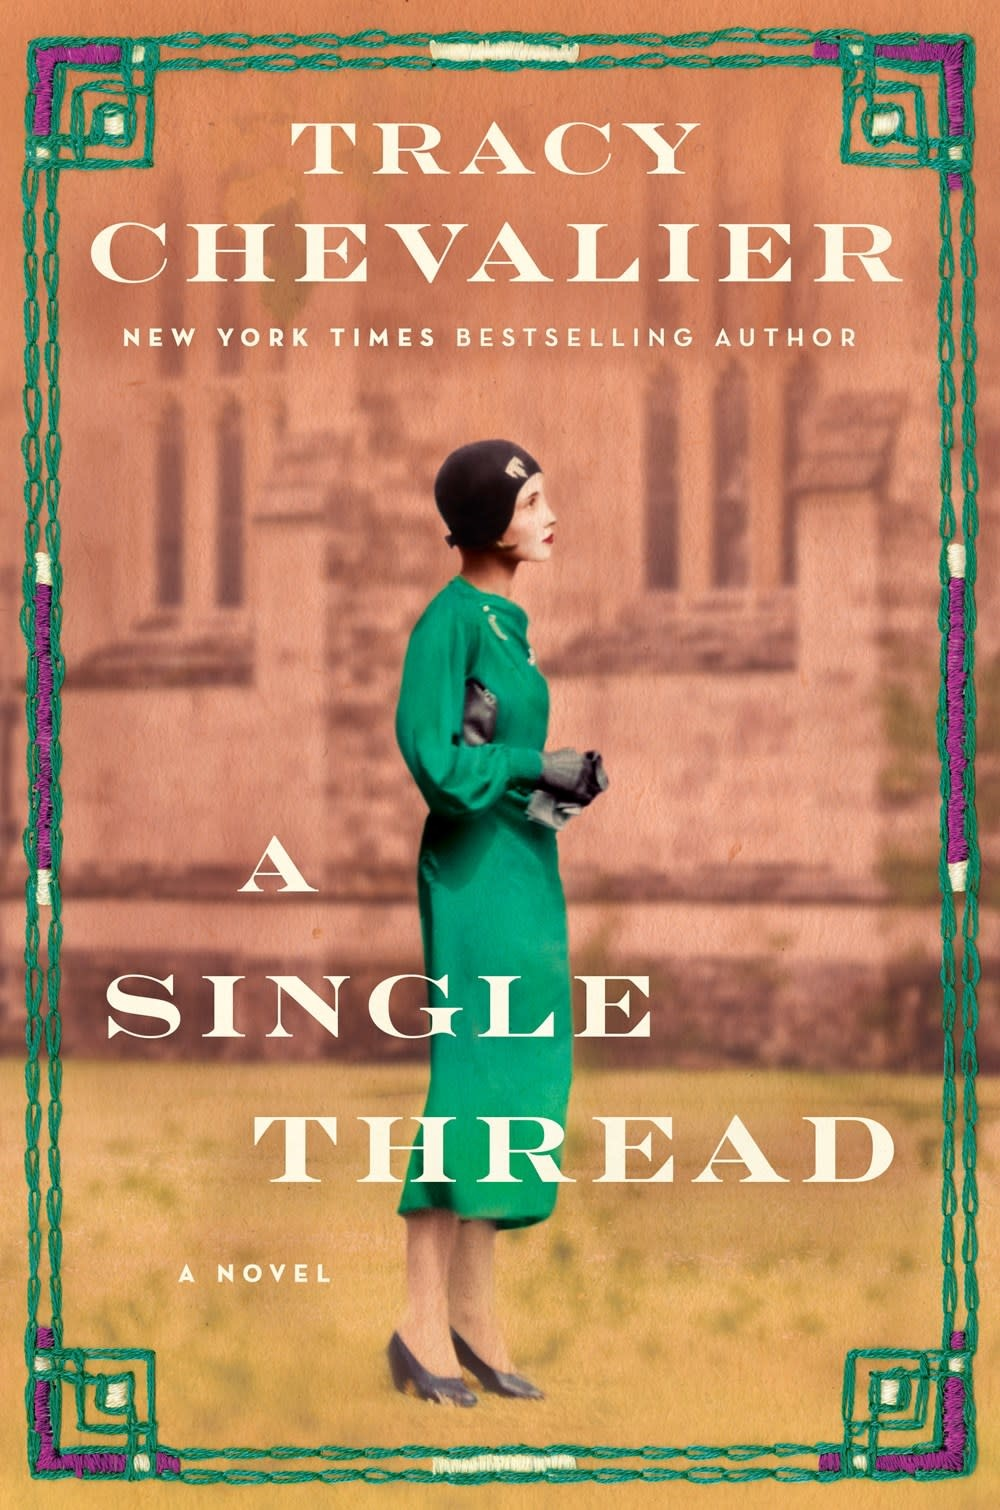 Viking A Single Thread: A Novel